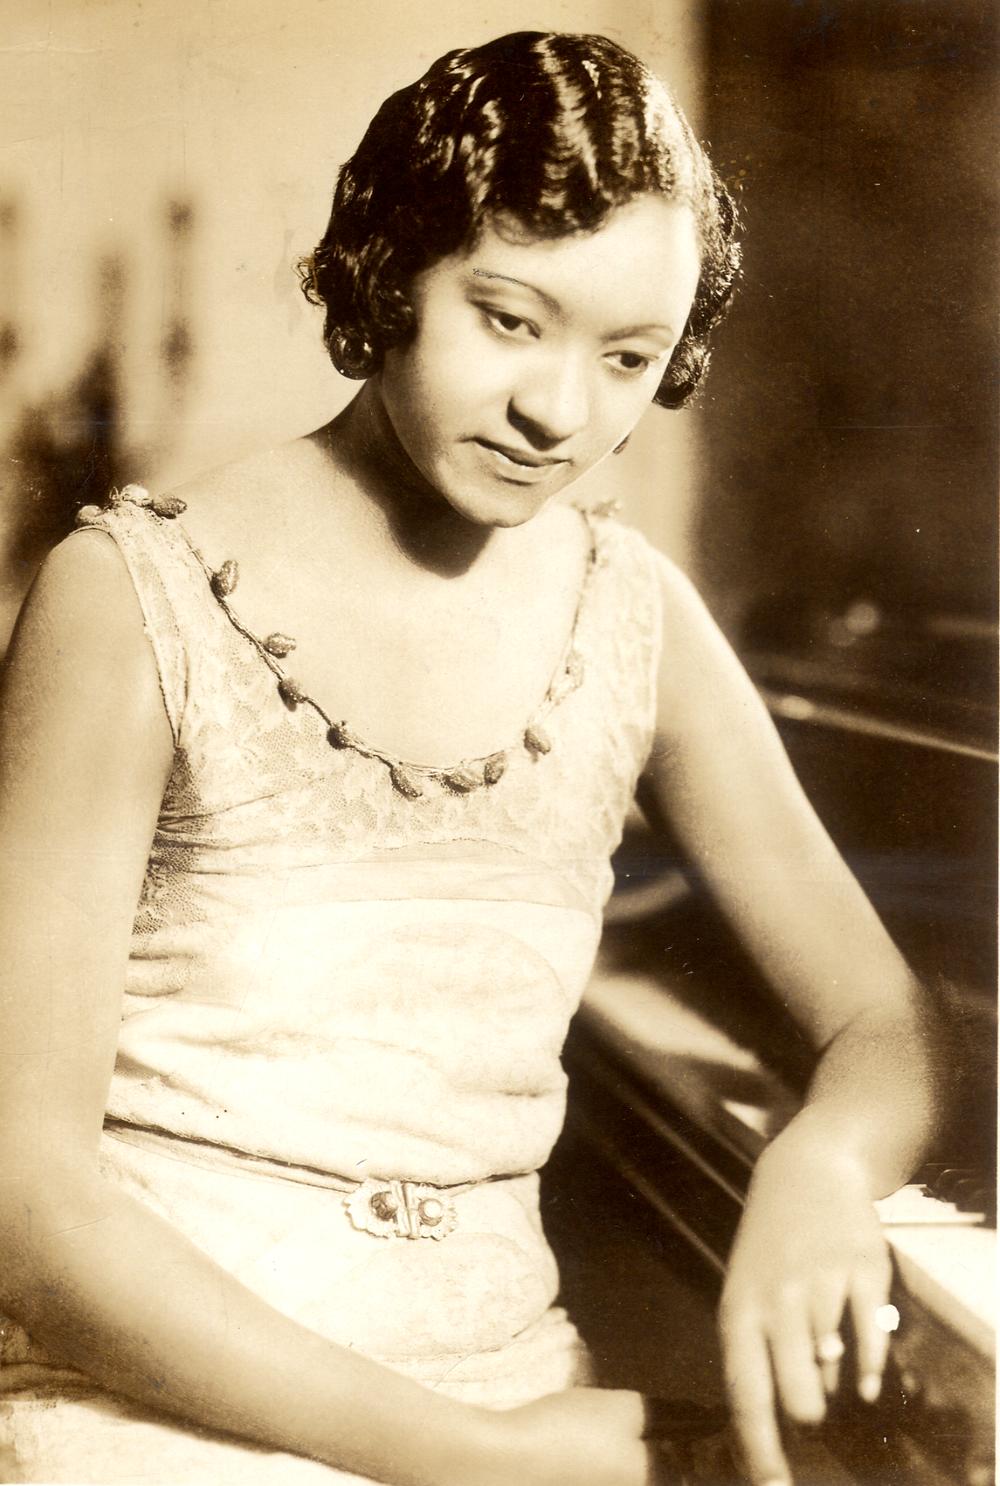 Jessie Covington Dent, circa 1931. Photo by A.P. Bedou.